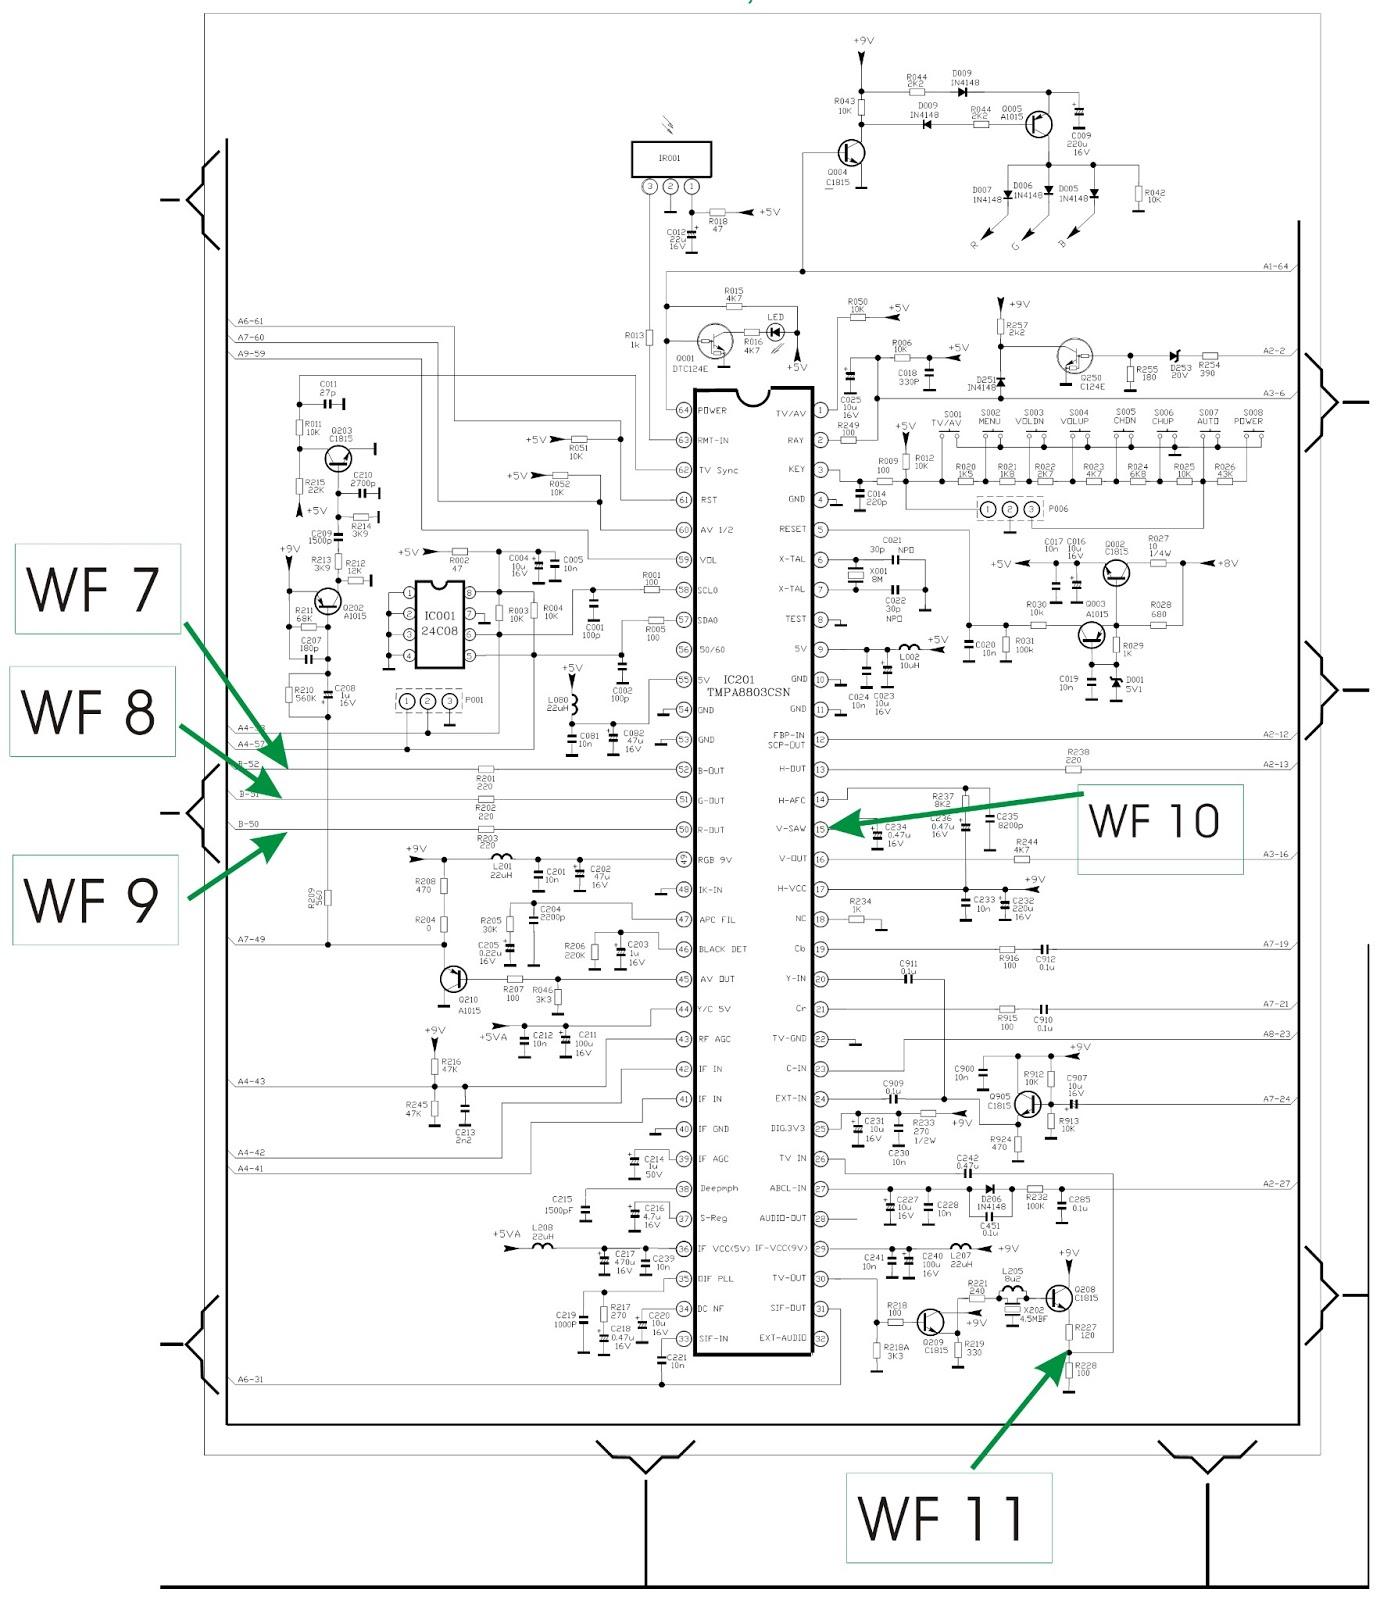 tcl ctr1042  u2013 ctr2014  u2013 ctr2116  u2013 ctr2516 - power supply smps - horizontal output